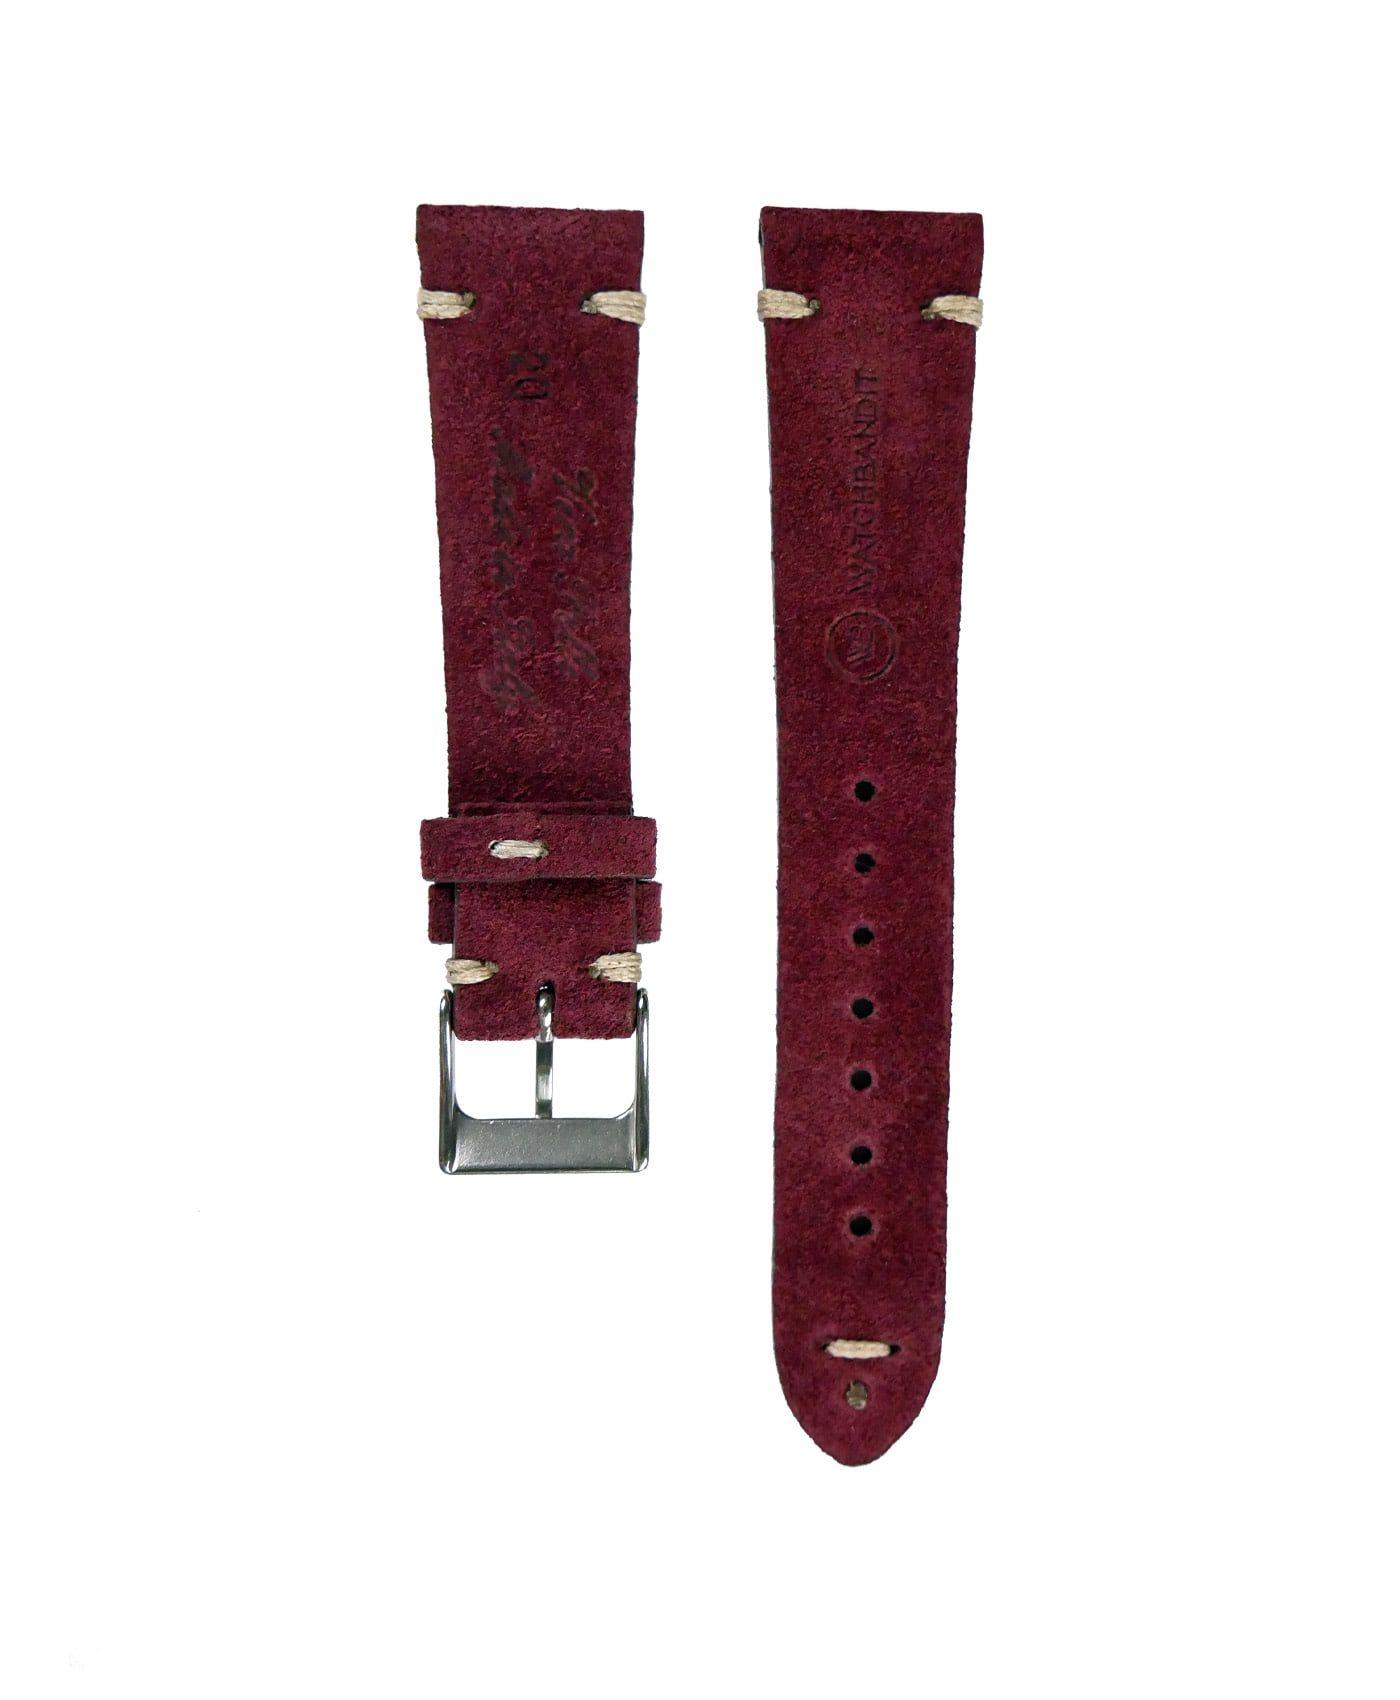 WB original premium suede watch strap burgundy bordeaux red rear